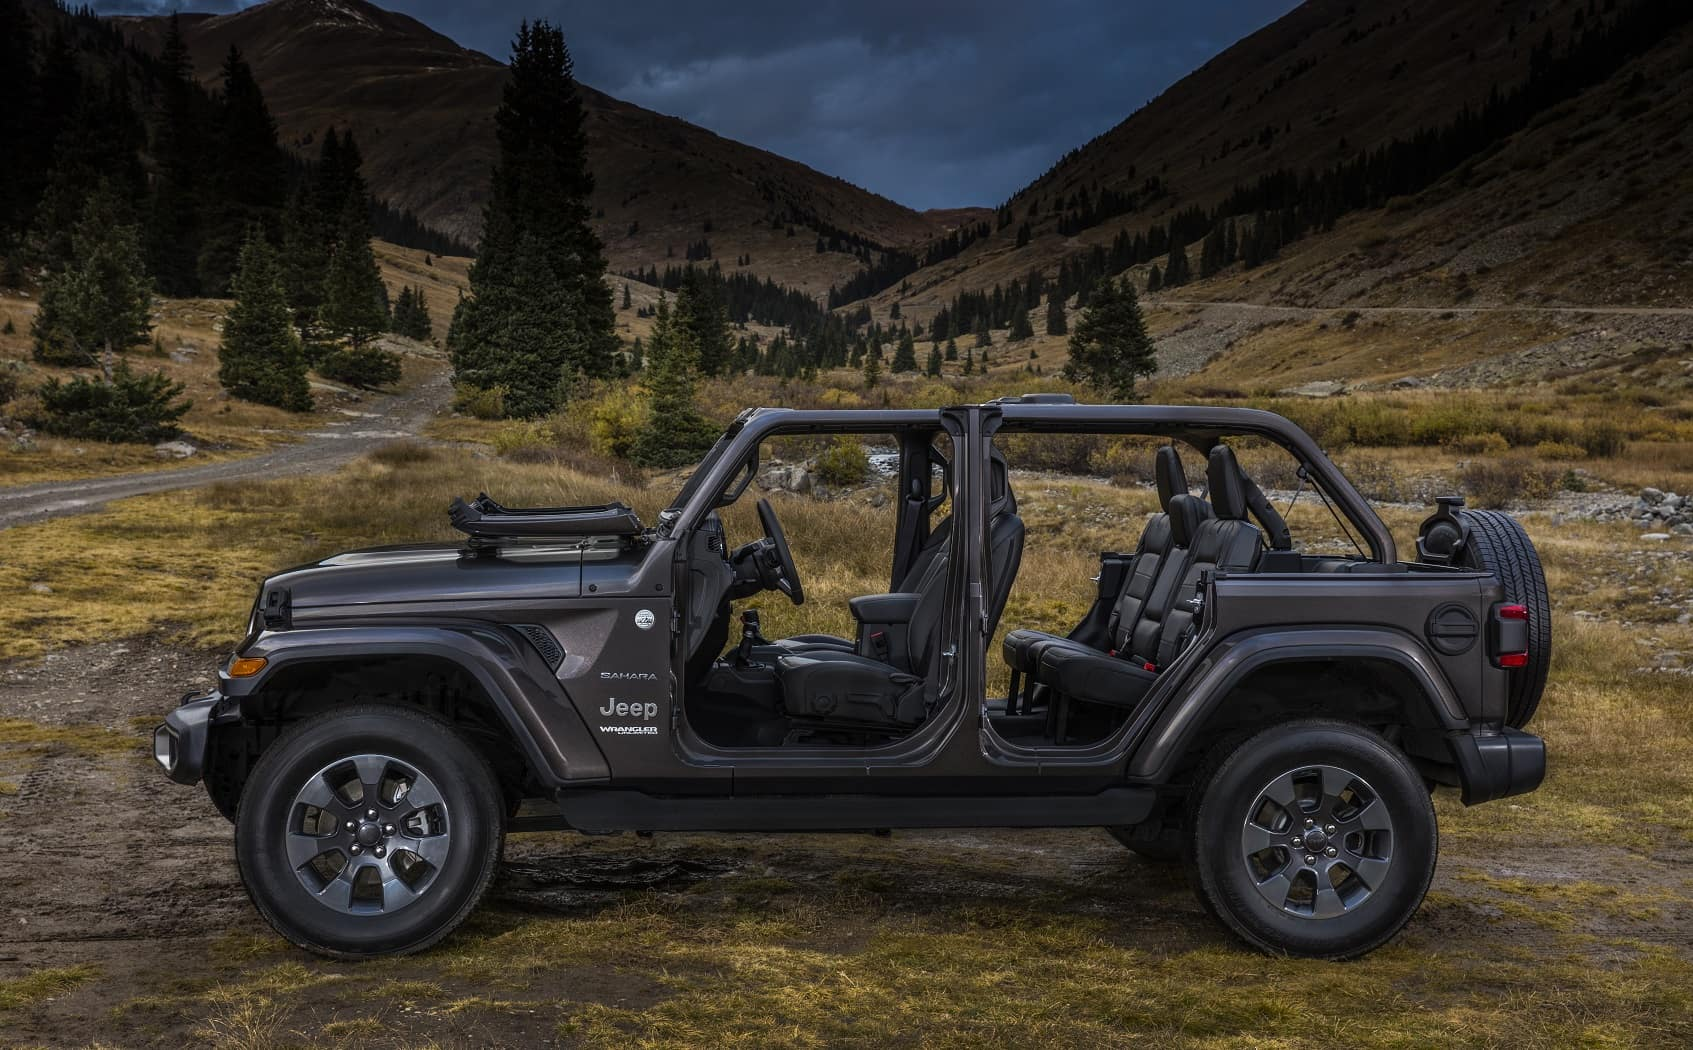 Jeep Wrangler Interior Space